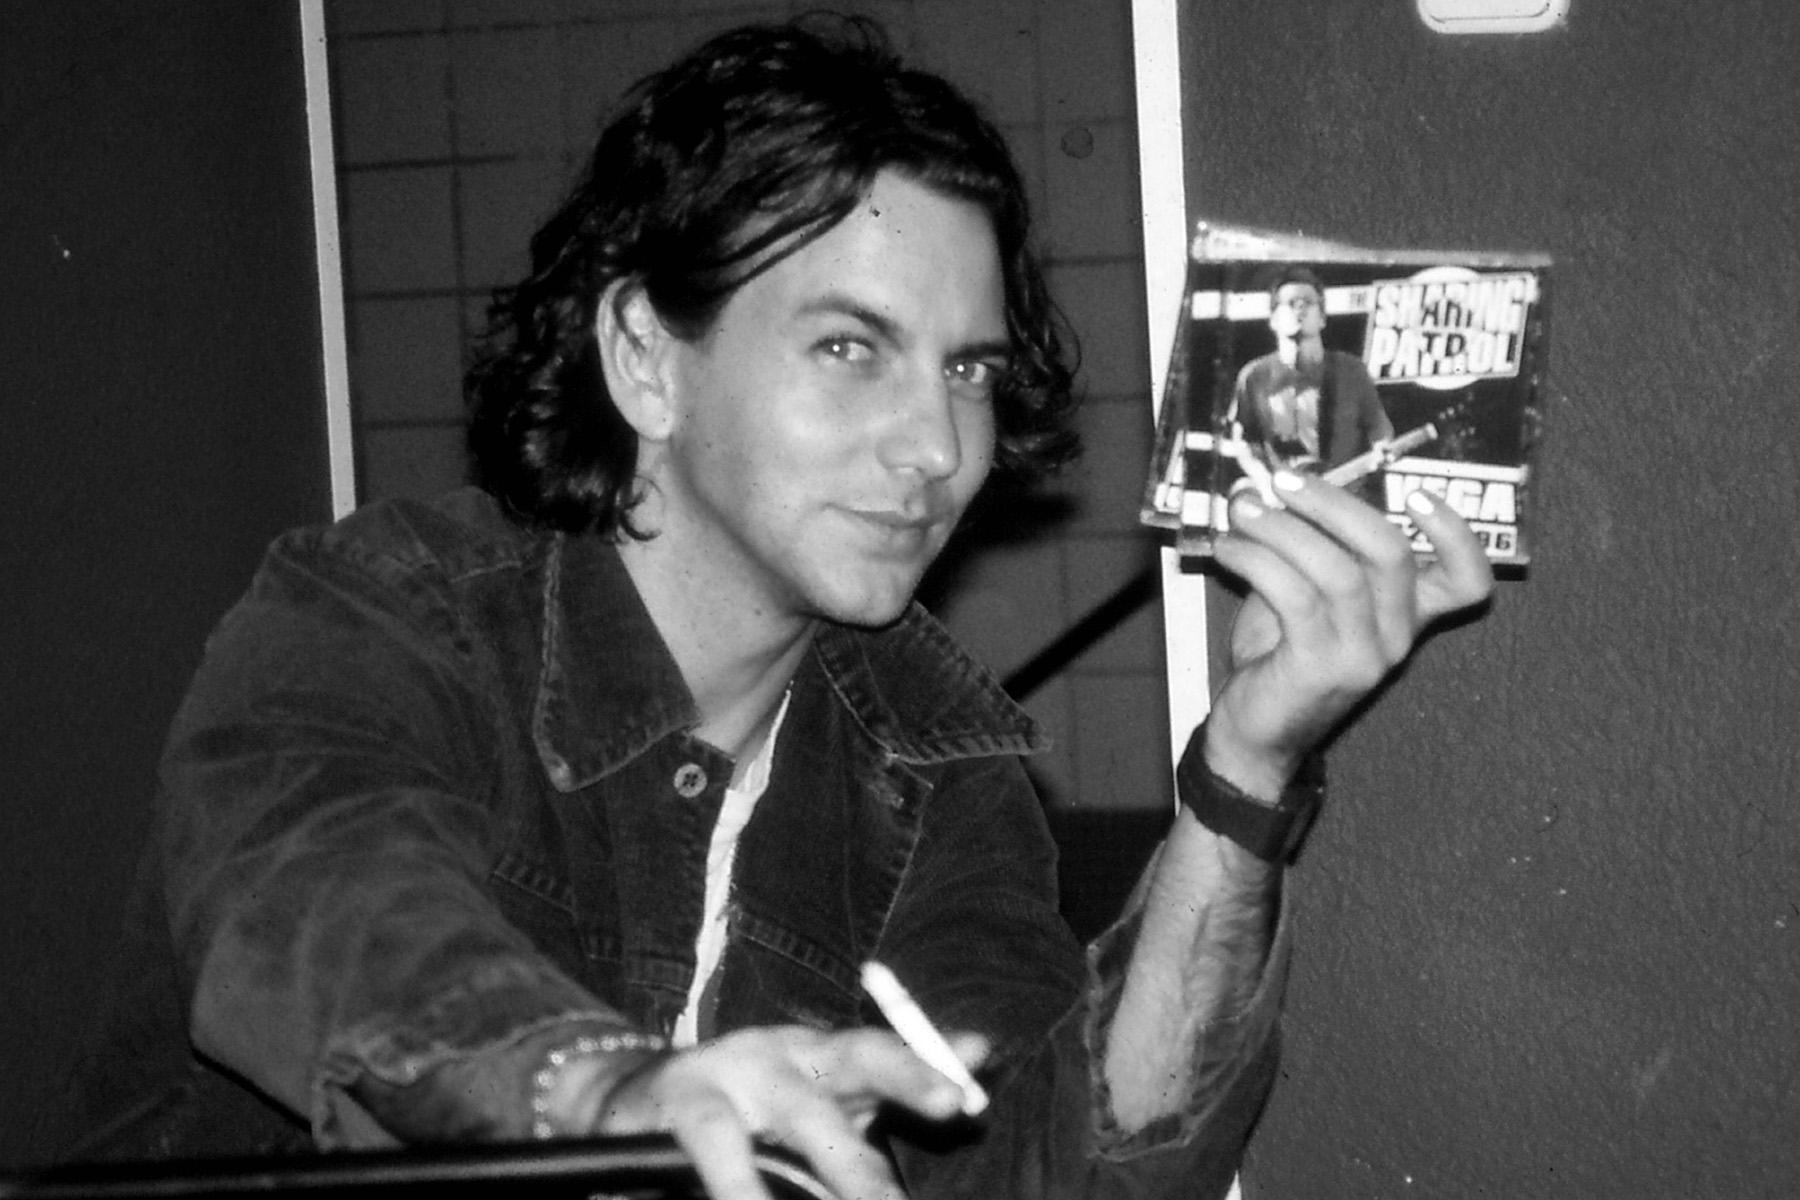 Eddie Vedder promotes The Sharing Patrol. Barcelona, Spain. November 22, 1996. Photo: Henrik Tuxen.